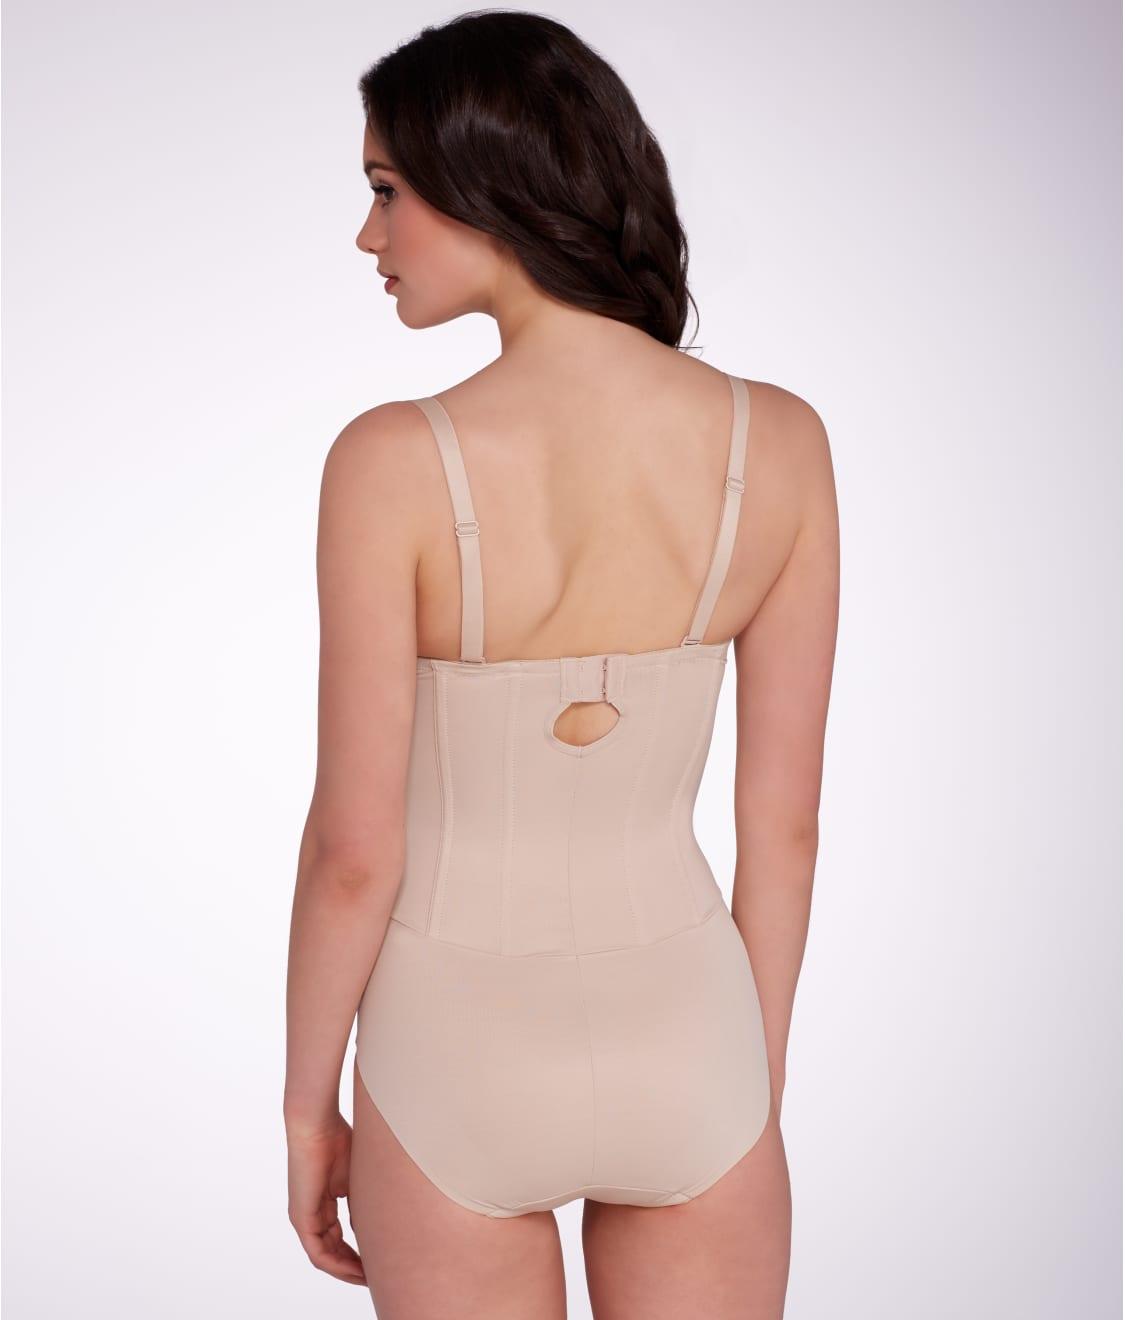 027058c5a010 TC Fine Intimates Extra Firm Control Convertible Bodysuit | Bare ...